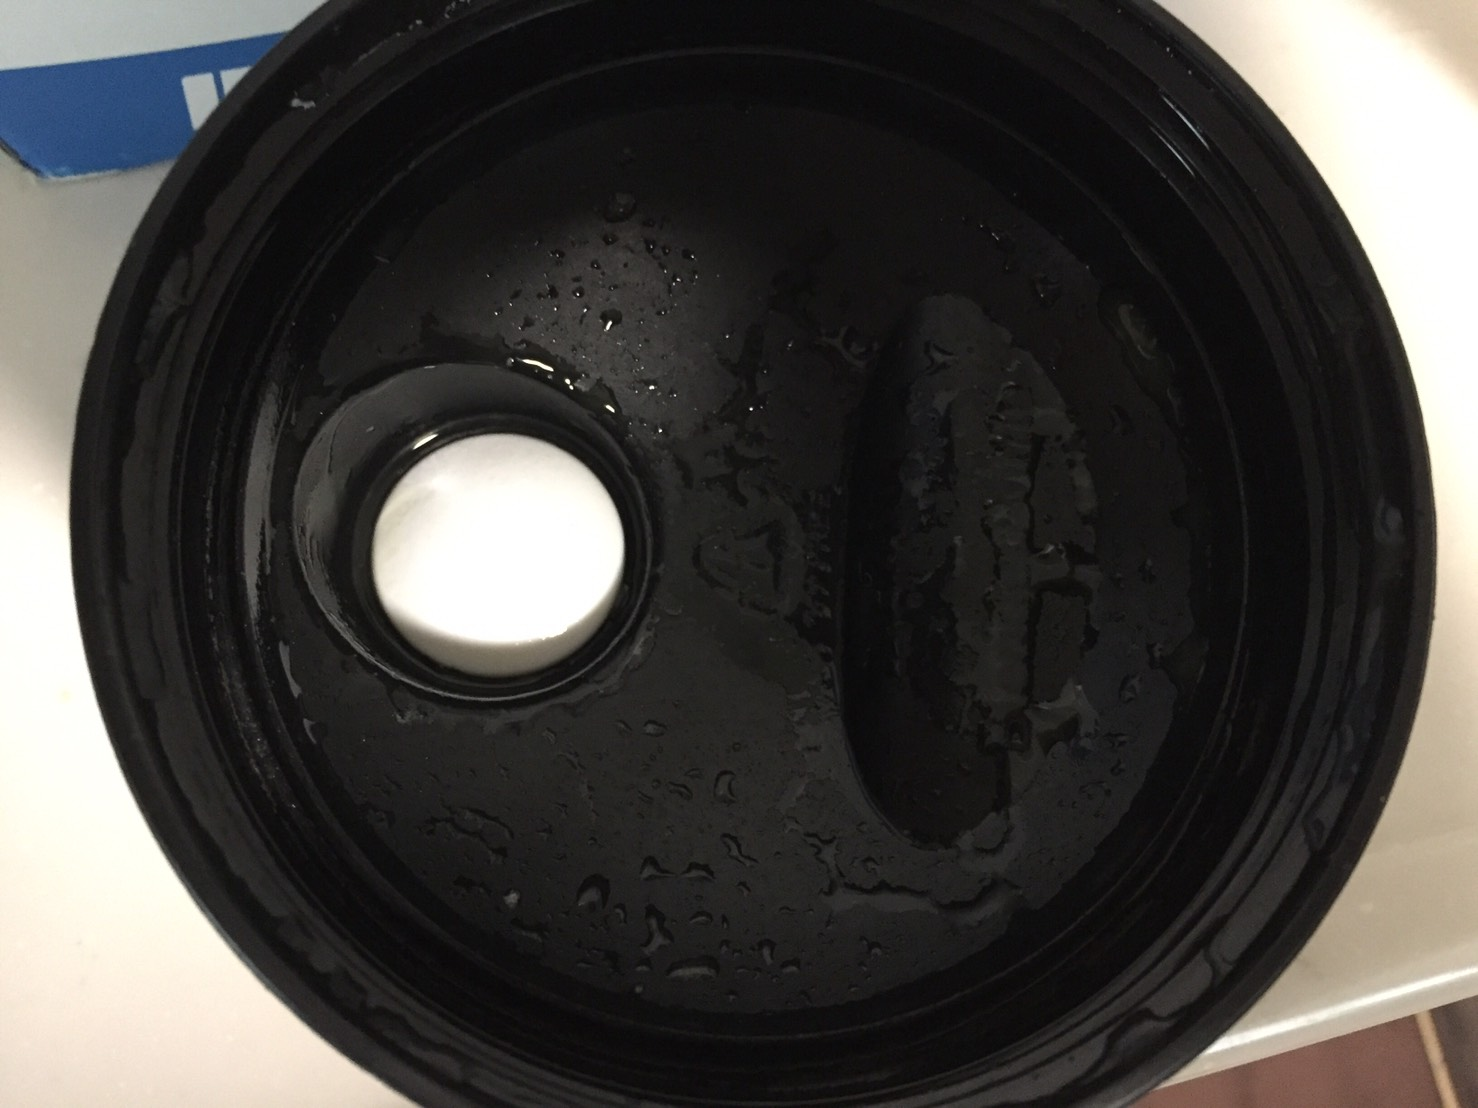 【WPI】IMPACT 分離ホエイプロテイン (アイソレート)「MATCHA FLAVOUR(抹茶味)」を飲み終えた様子。蓋側